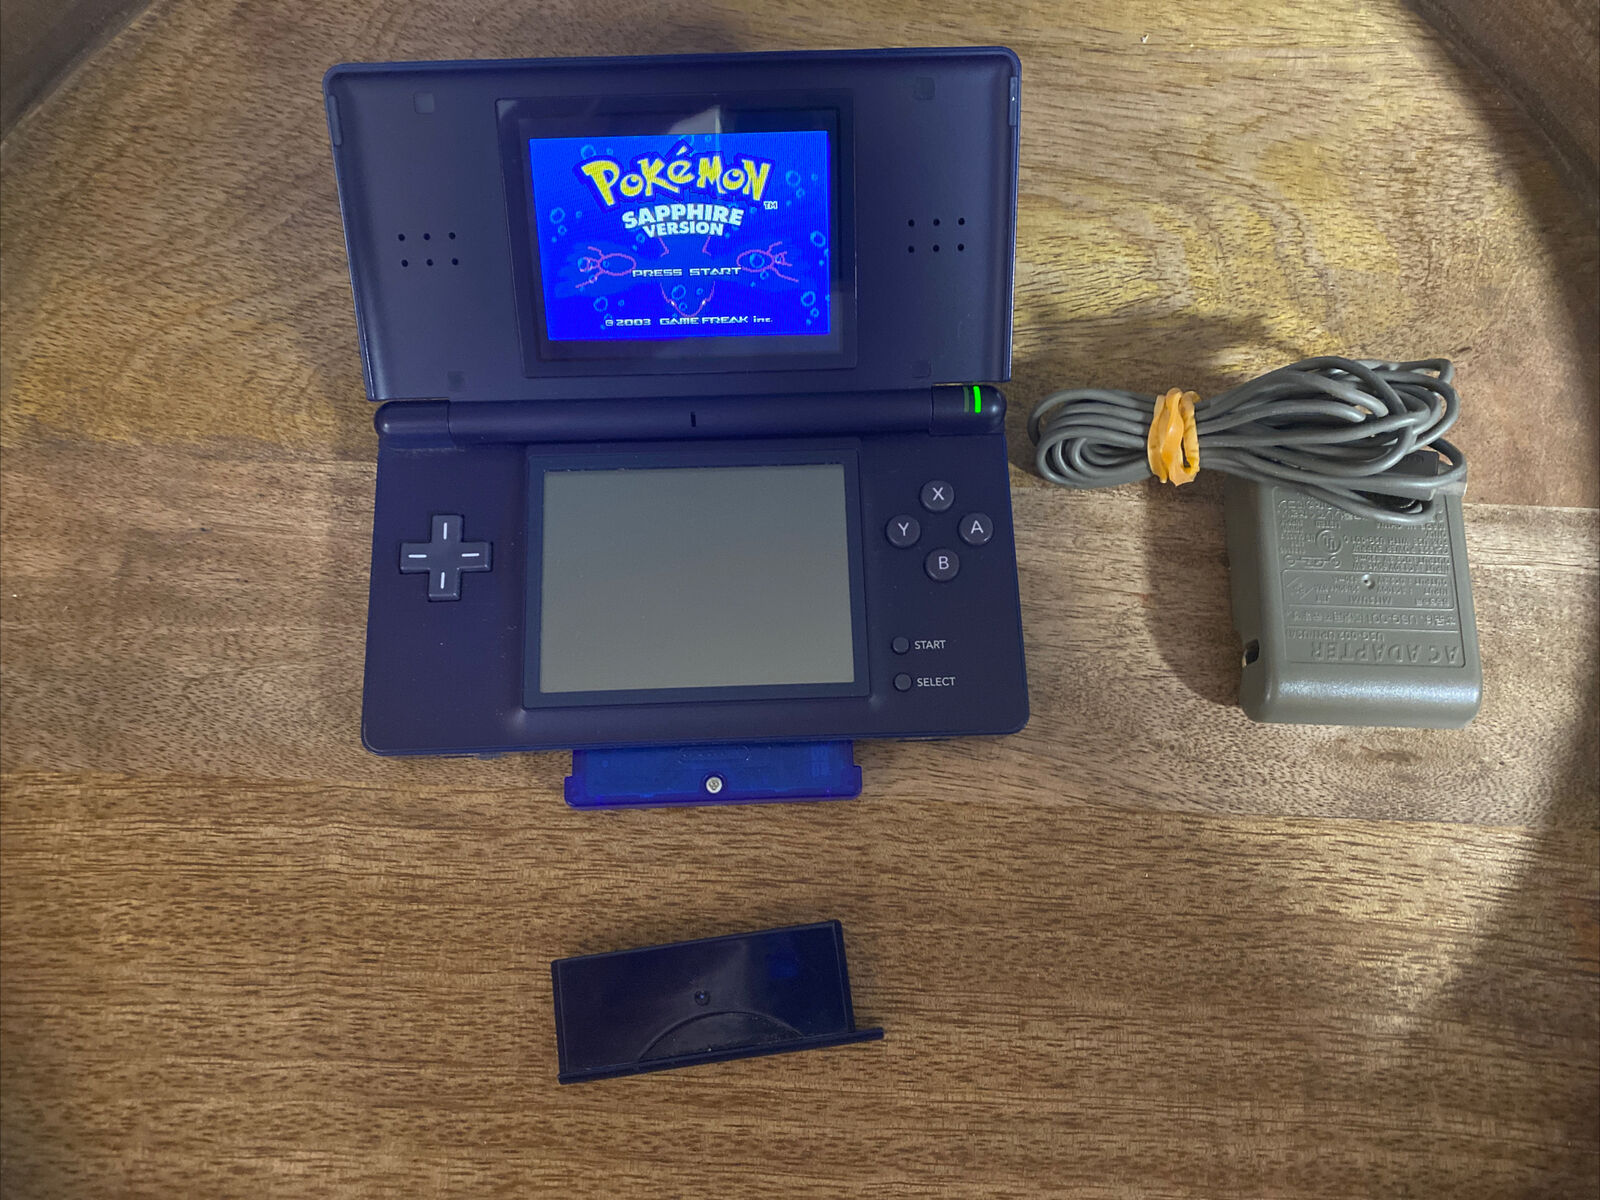 Nintendo DS Lite Handheld Console - Cobalt Blue In Excellent Condition